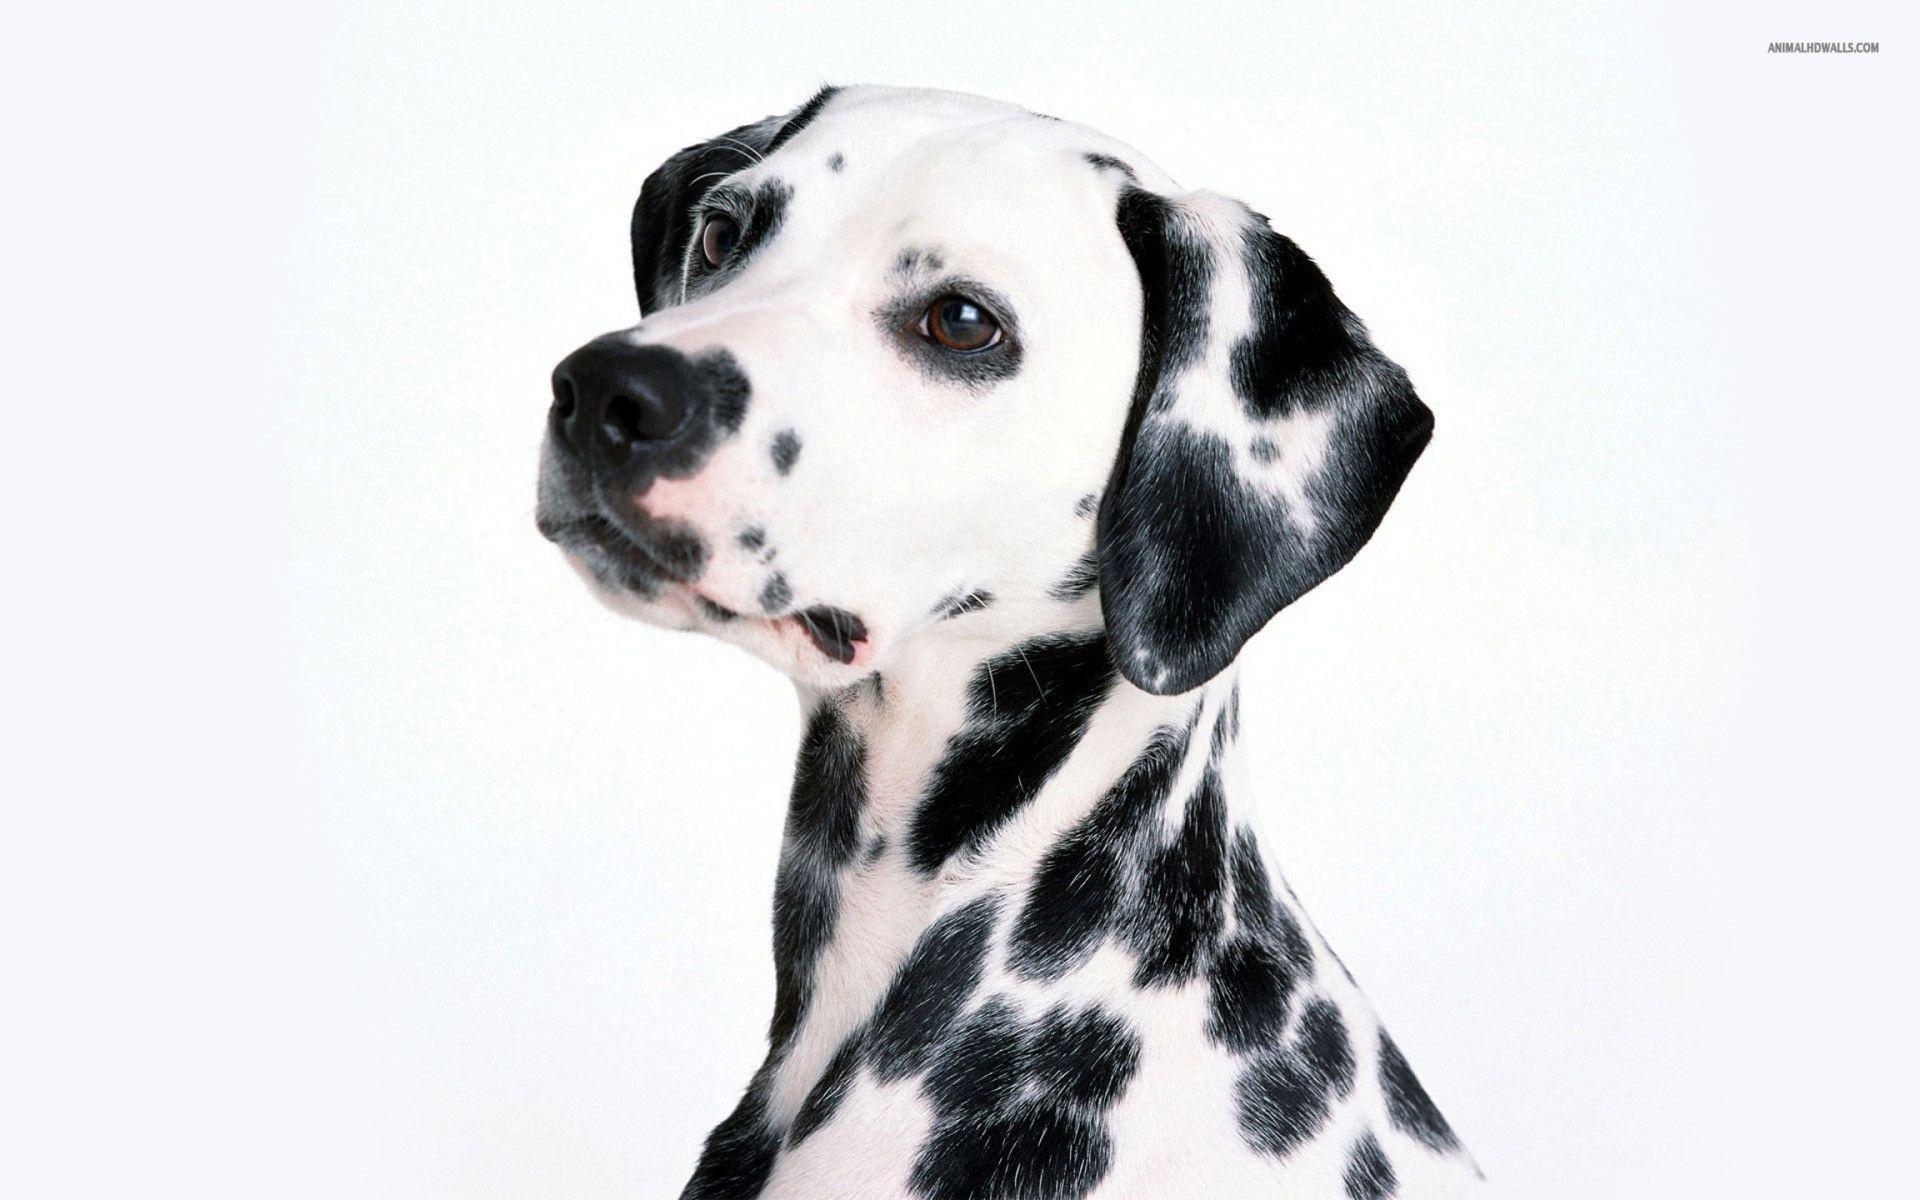 Dalmatian HD wallpapers, Desktop wallpaper - most viewed